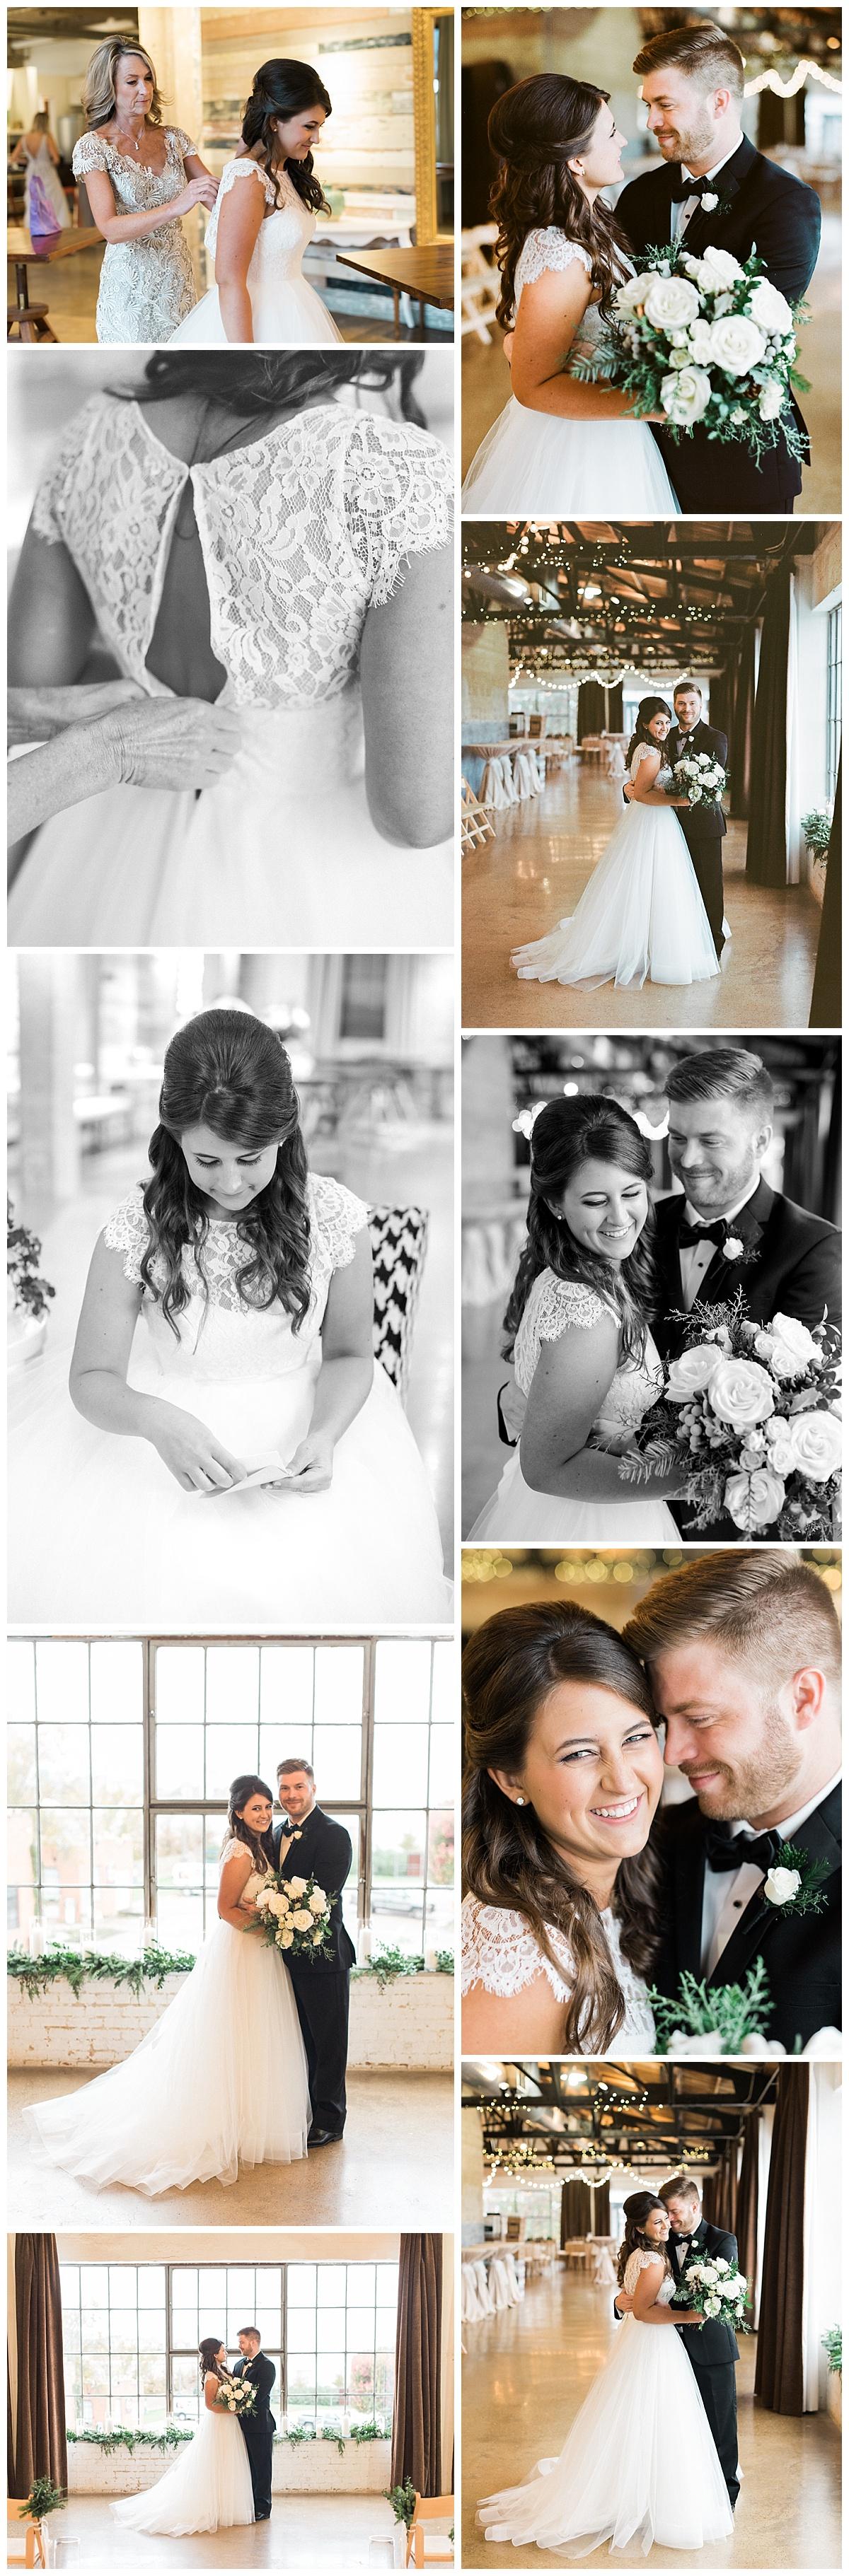 hickory-street-annex-wedding-ar-photography-2.jpg